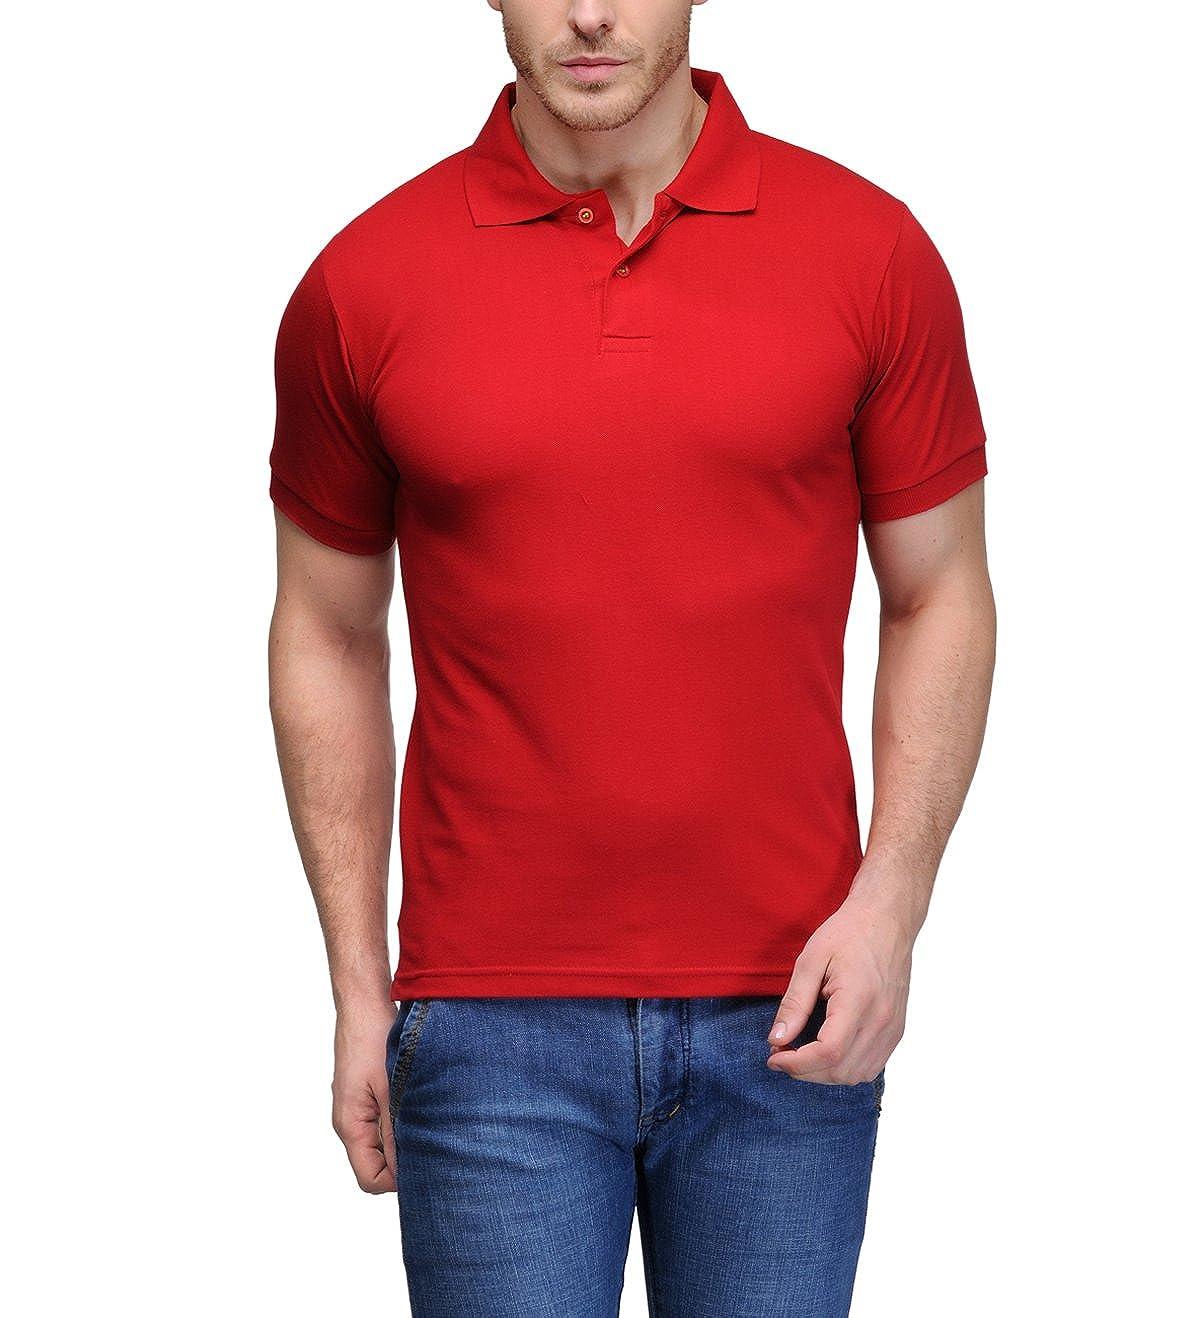 46670c9b Scott Men's Plain Rich Cotton Polo T-Shirt - Red: Amazon.in: Clothing &  Accessories